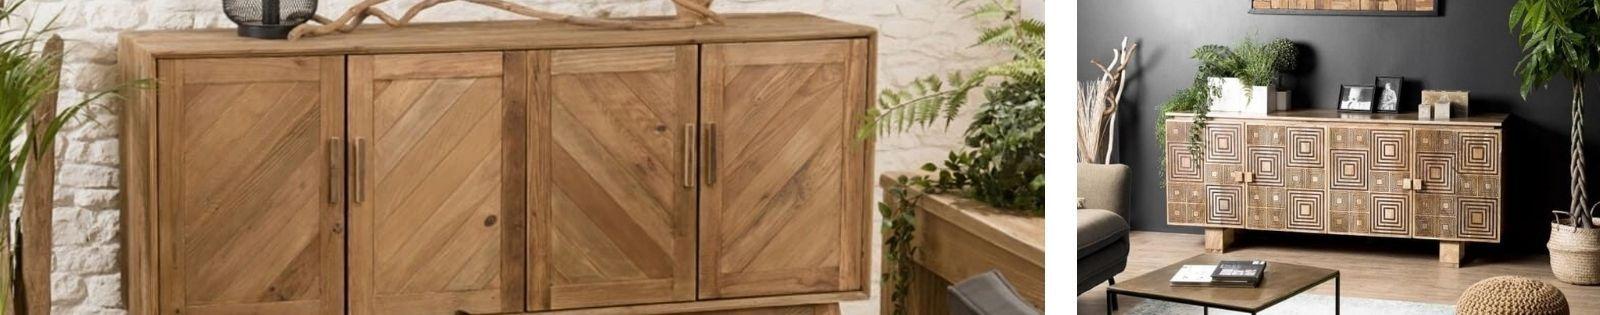 Buffet en bois massif : acacia, chêne, hévéa, teck... Lotuséa